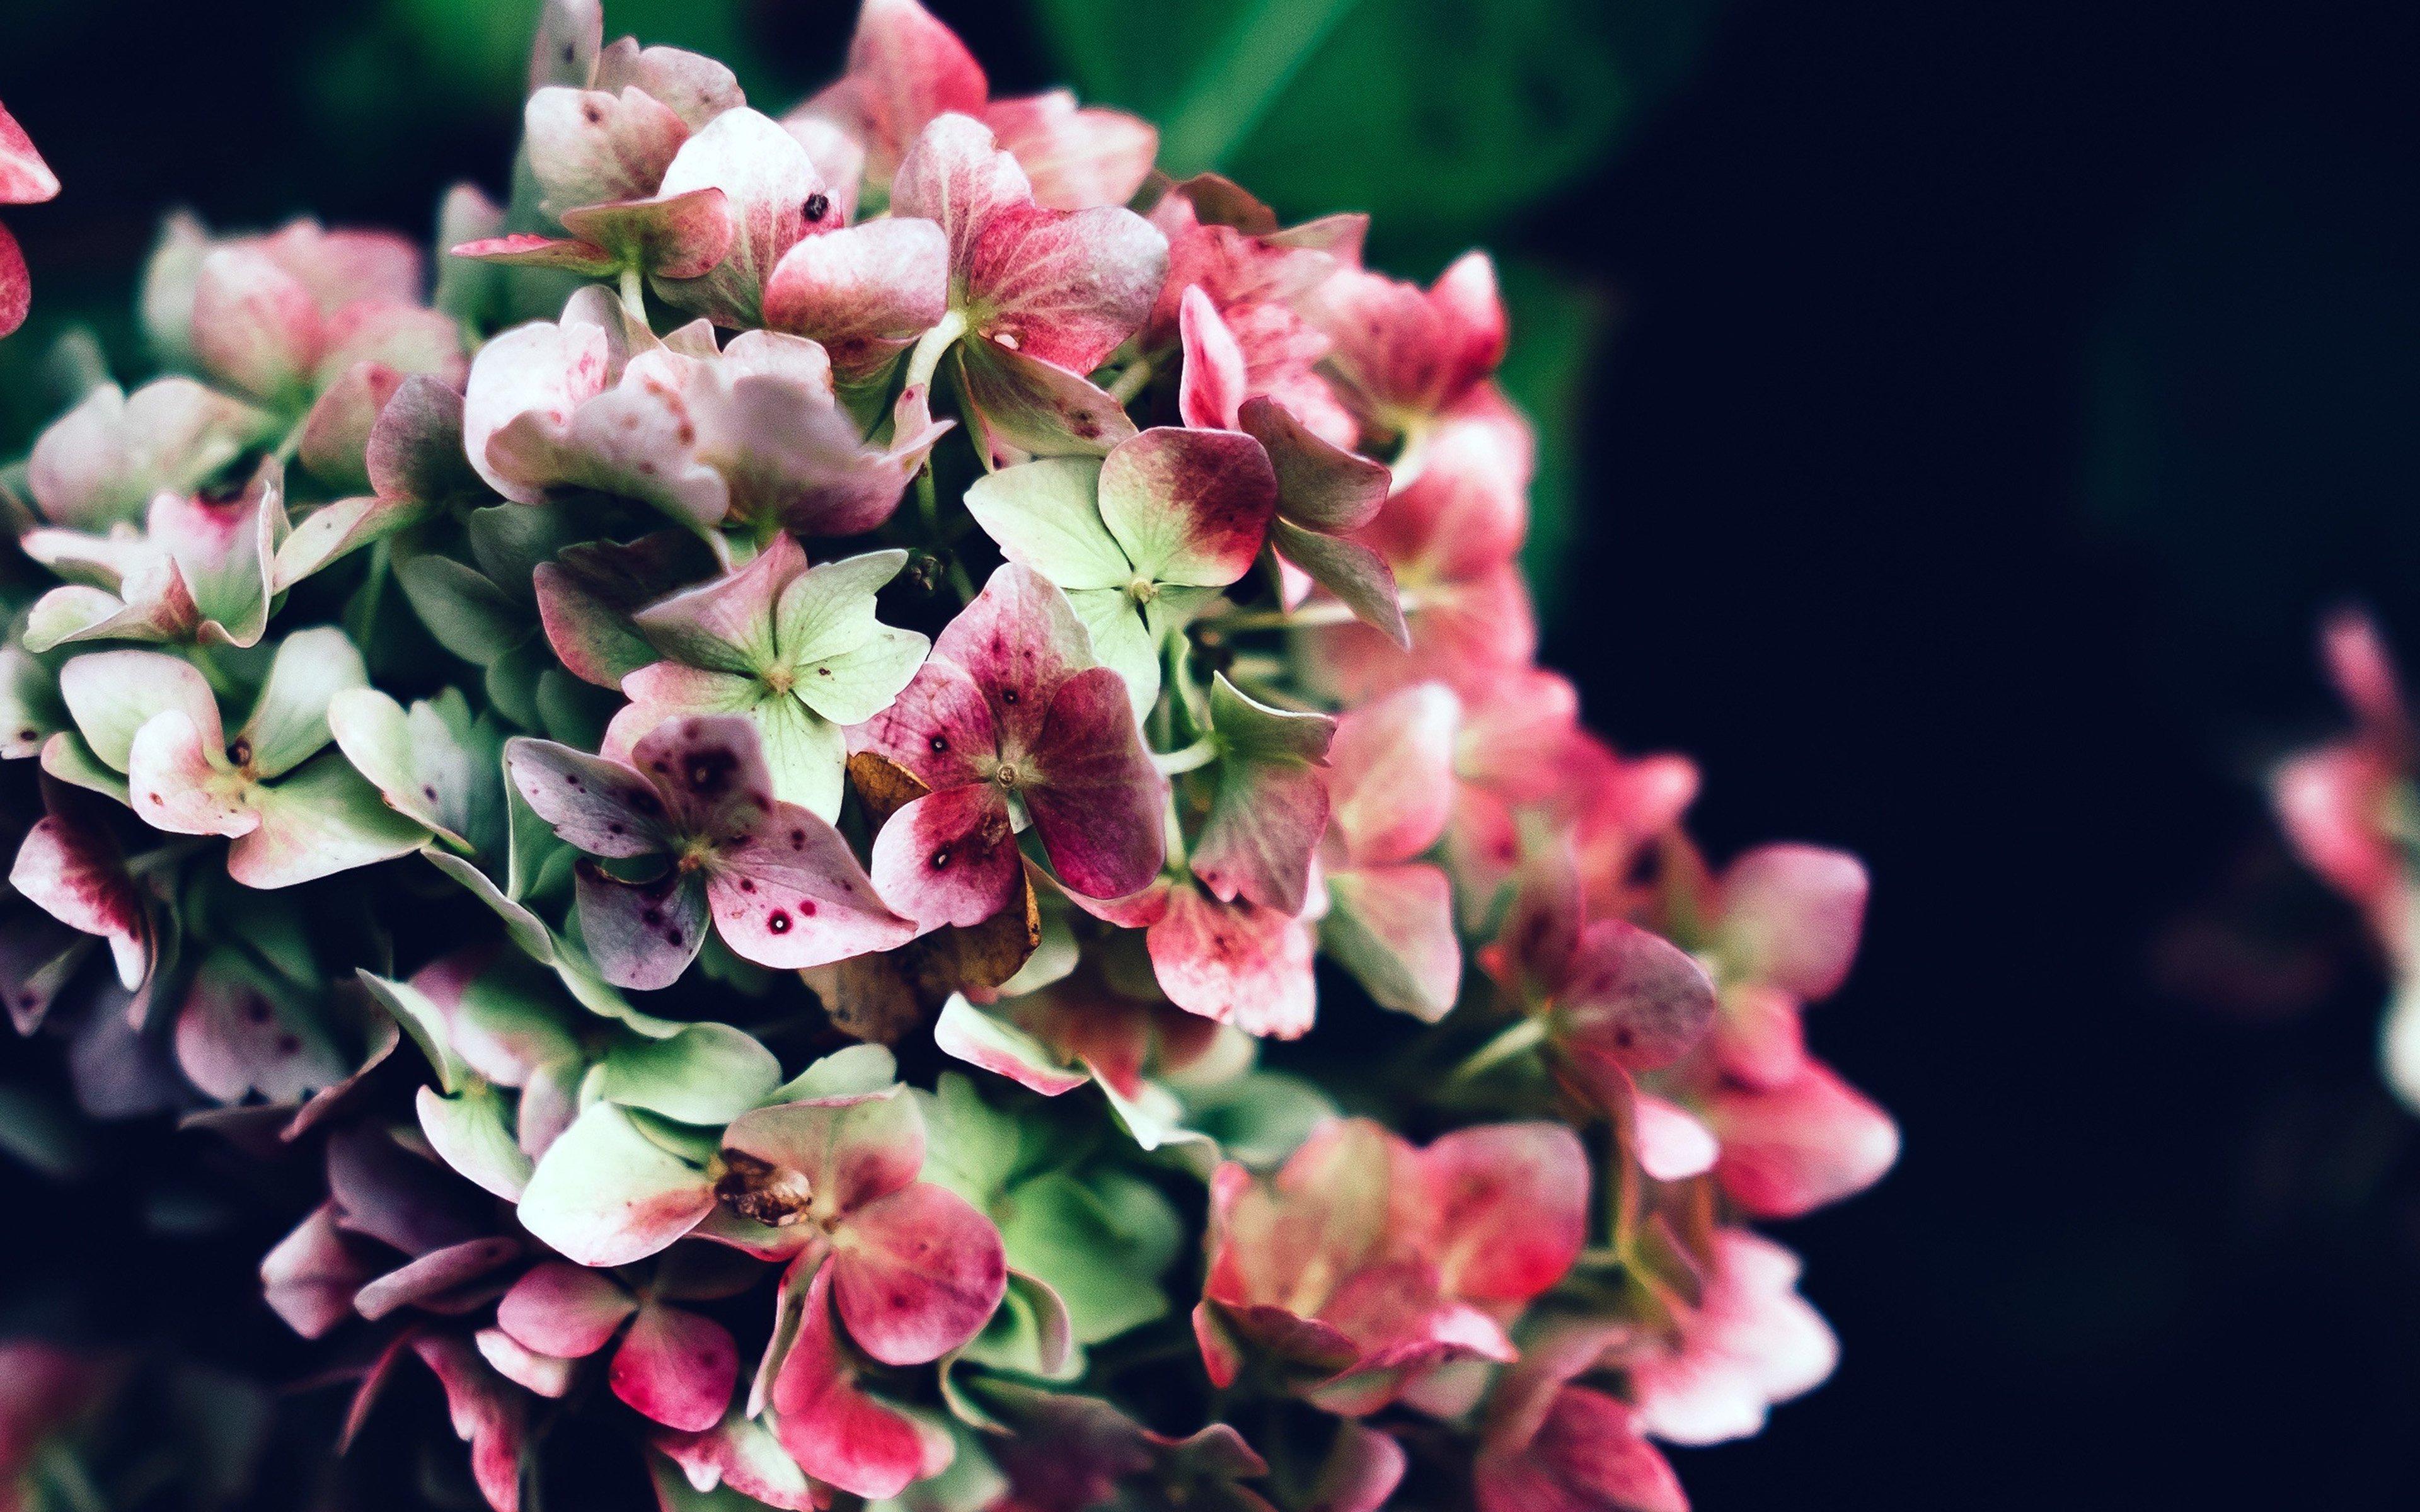 Fondos de pantalla Flores rosa